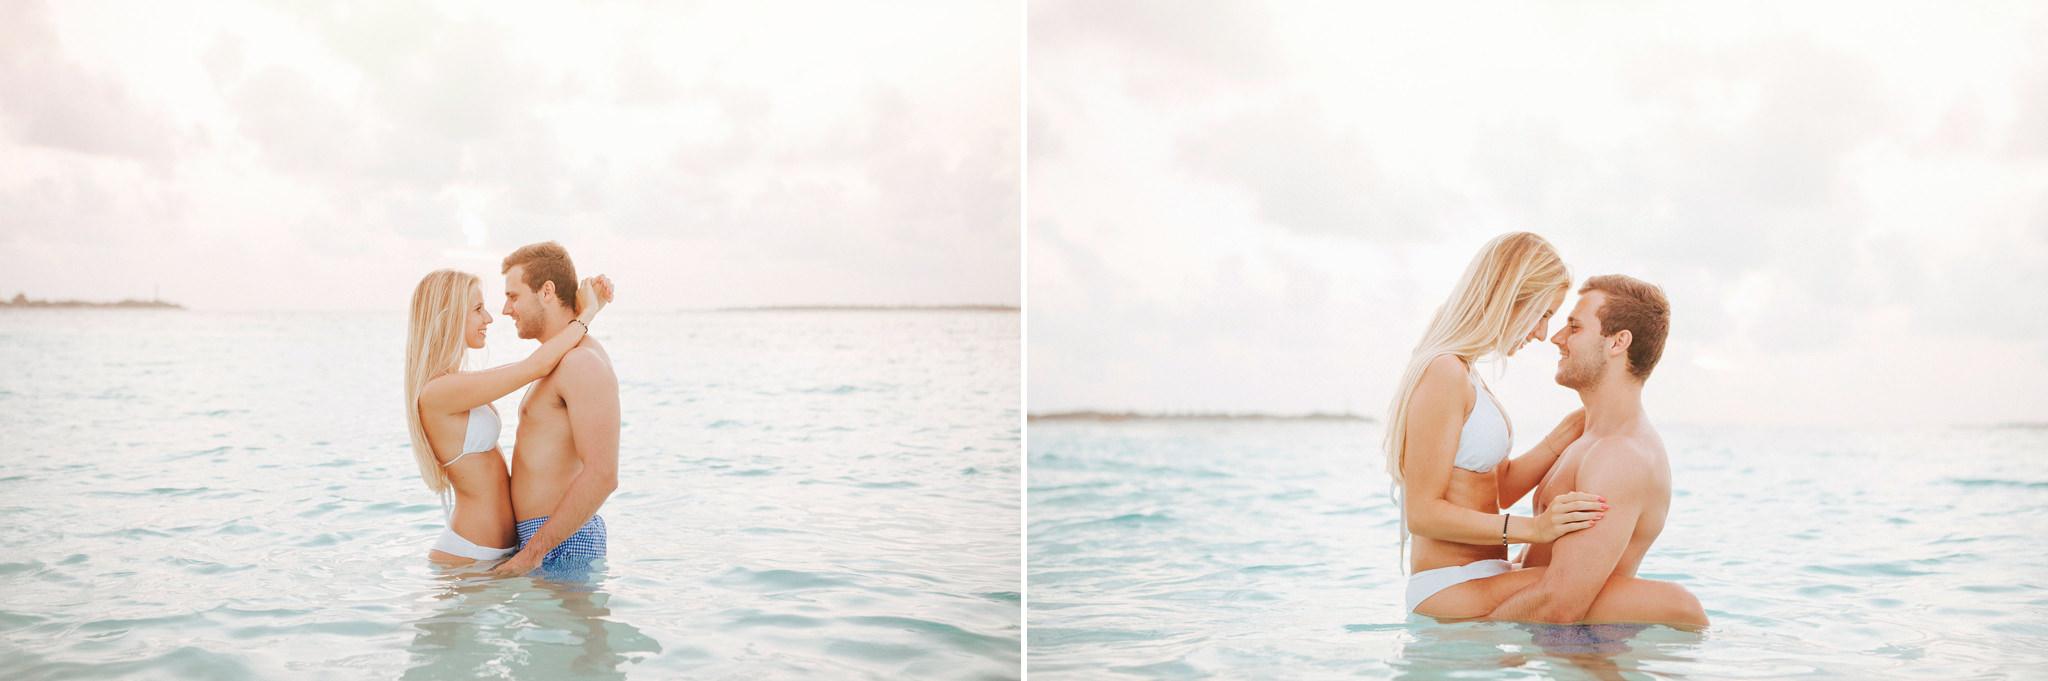 046-maldives-destination-wedding-photographer.jpg